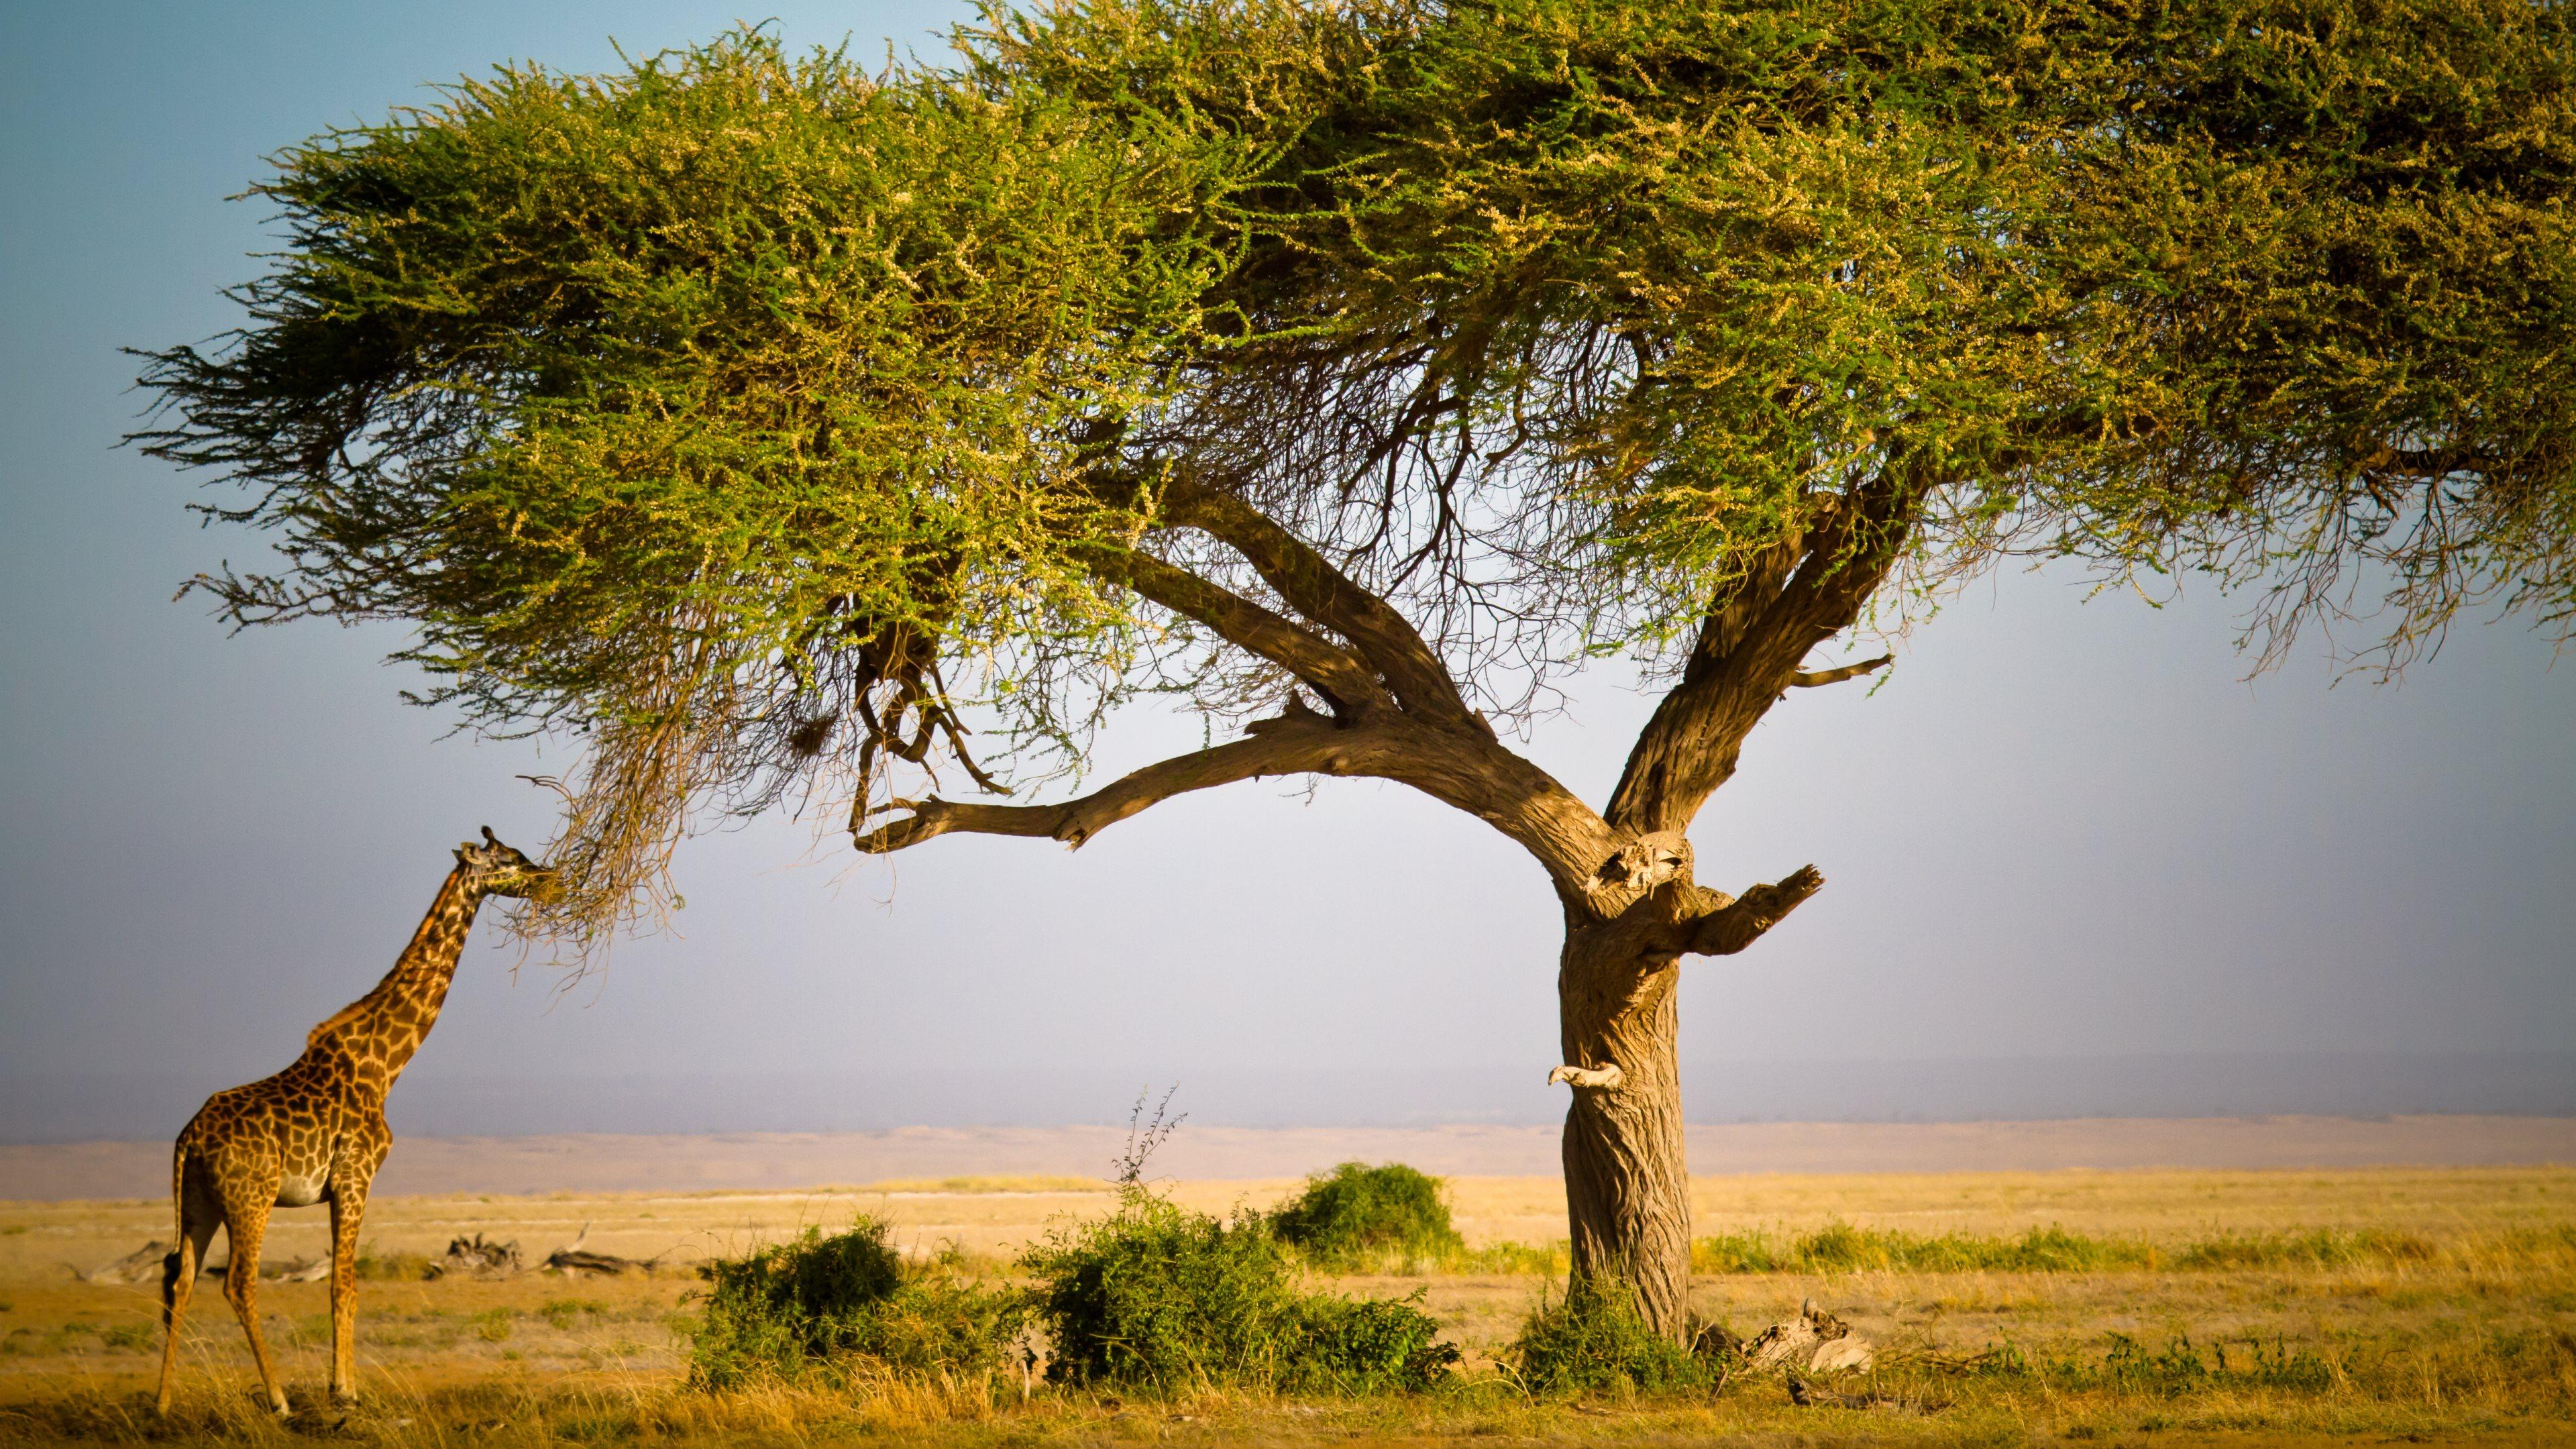 Giraffe Masai Mara Ultra Hd Wallpapers Imgpile